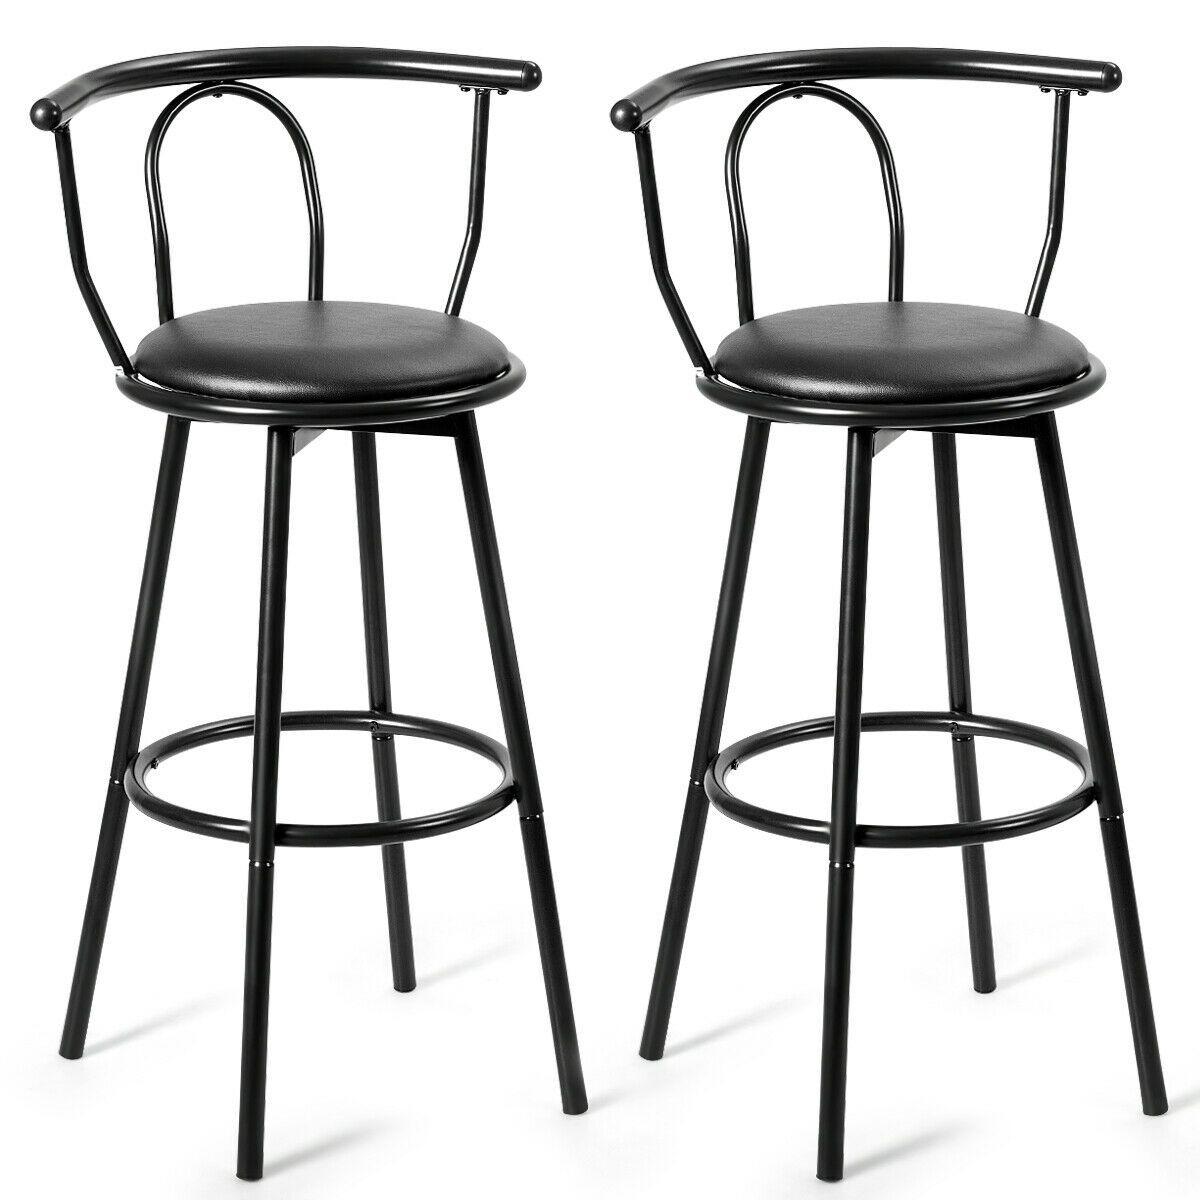 Set Of 2 Swivel Seat Metal Frame Bar Stools With Footrest In 2020 Metal Bar Stools Bar Stools Stainless Steel Bar Stools